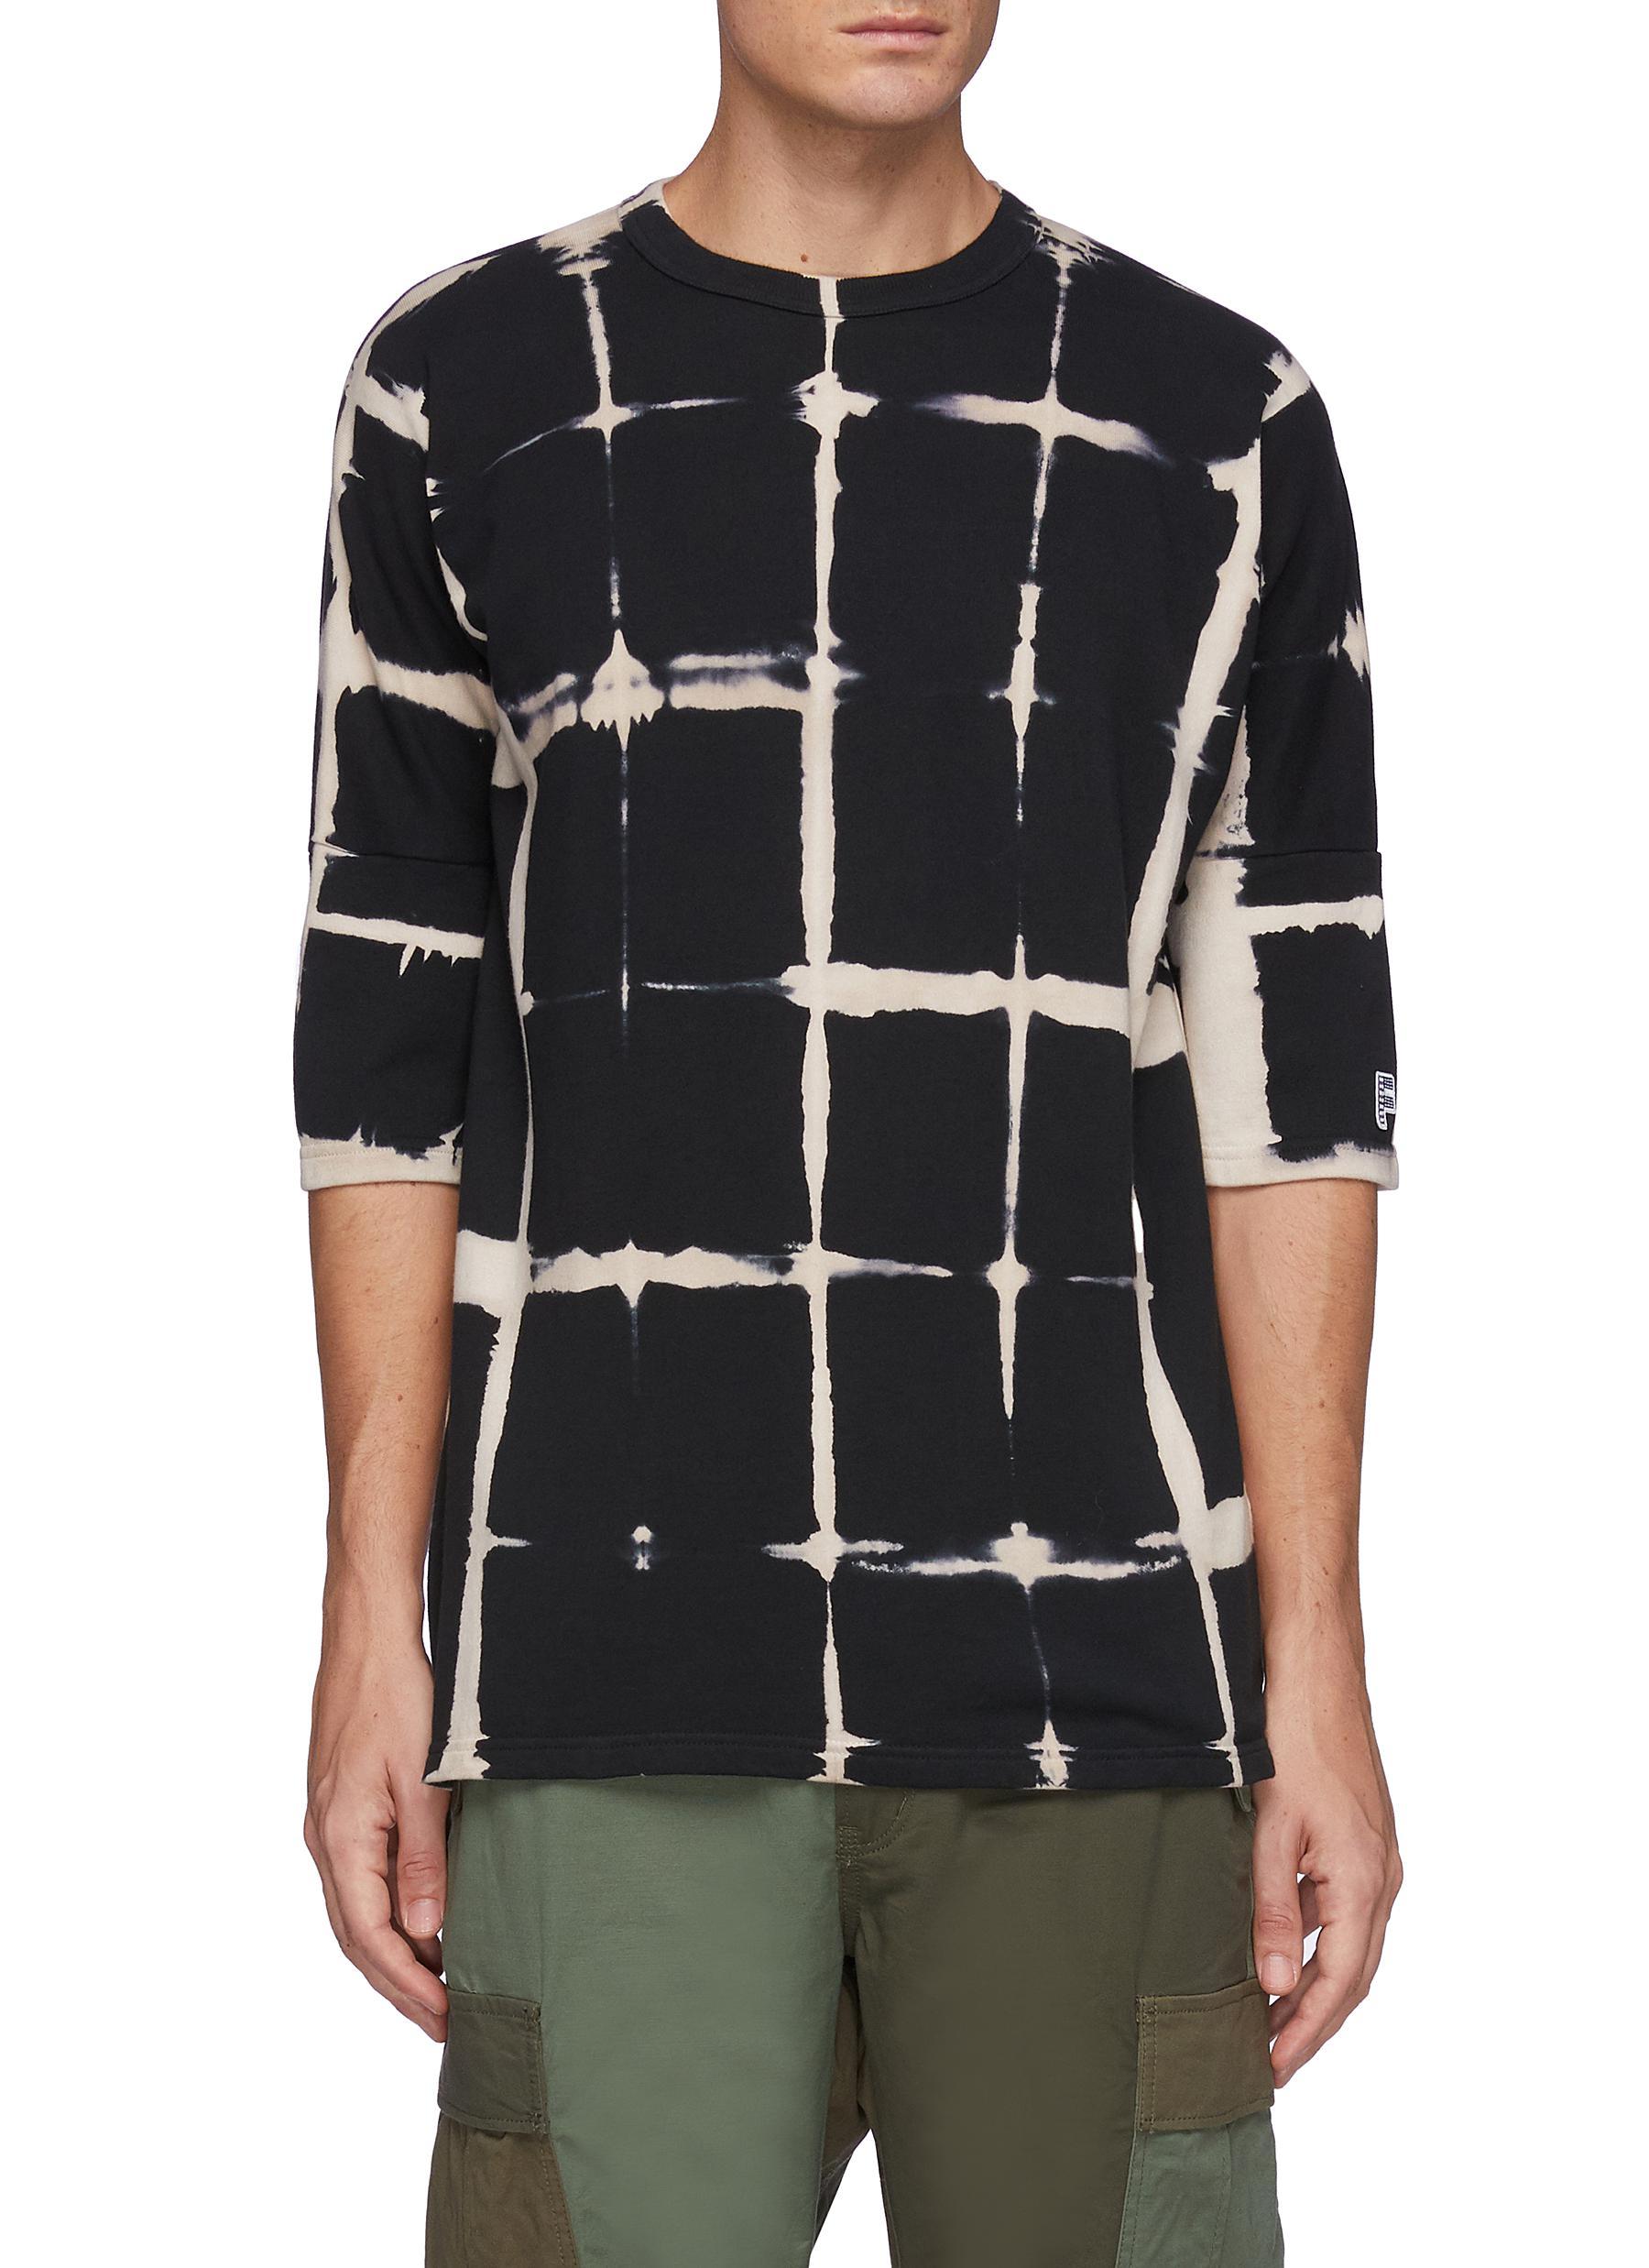 Grided Tie Dye Quarter Sleeved Cotton Oversized Crewneck T-Shirt